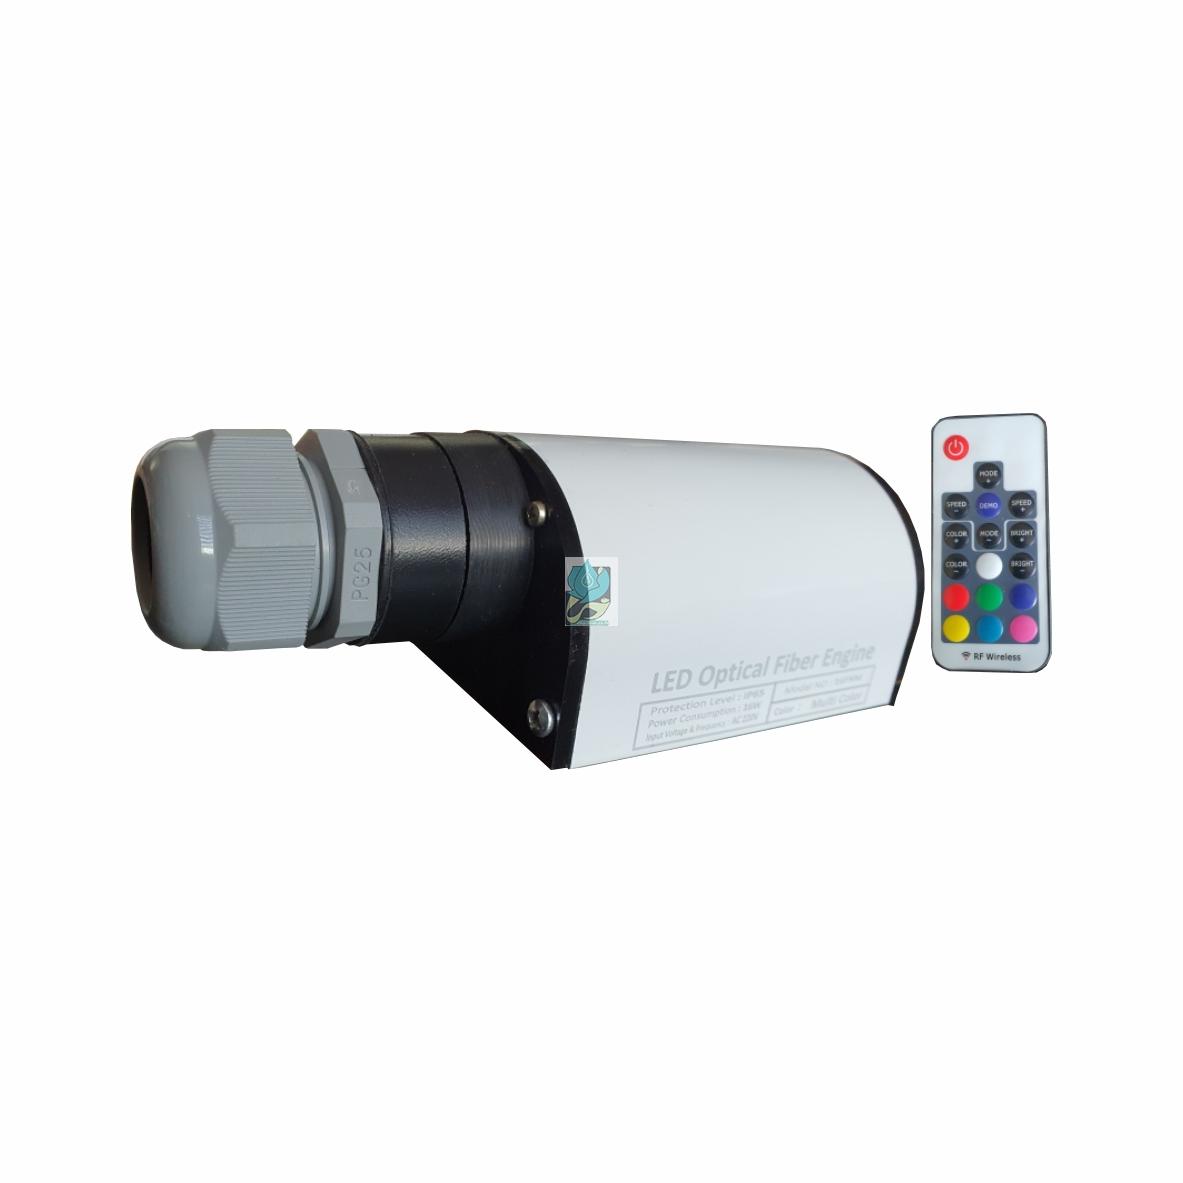 چراغ انجین فیبر نوری تک رنگ 25 وات 12 ولت مخصوص ماشین مدل 25FN